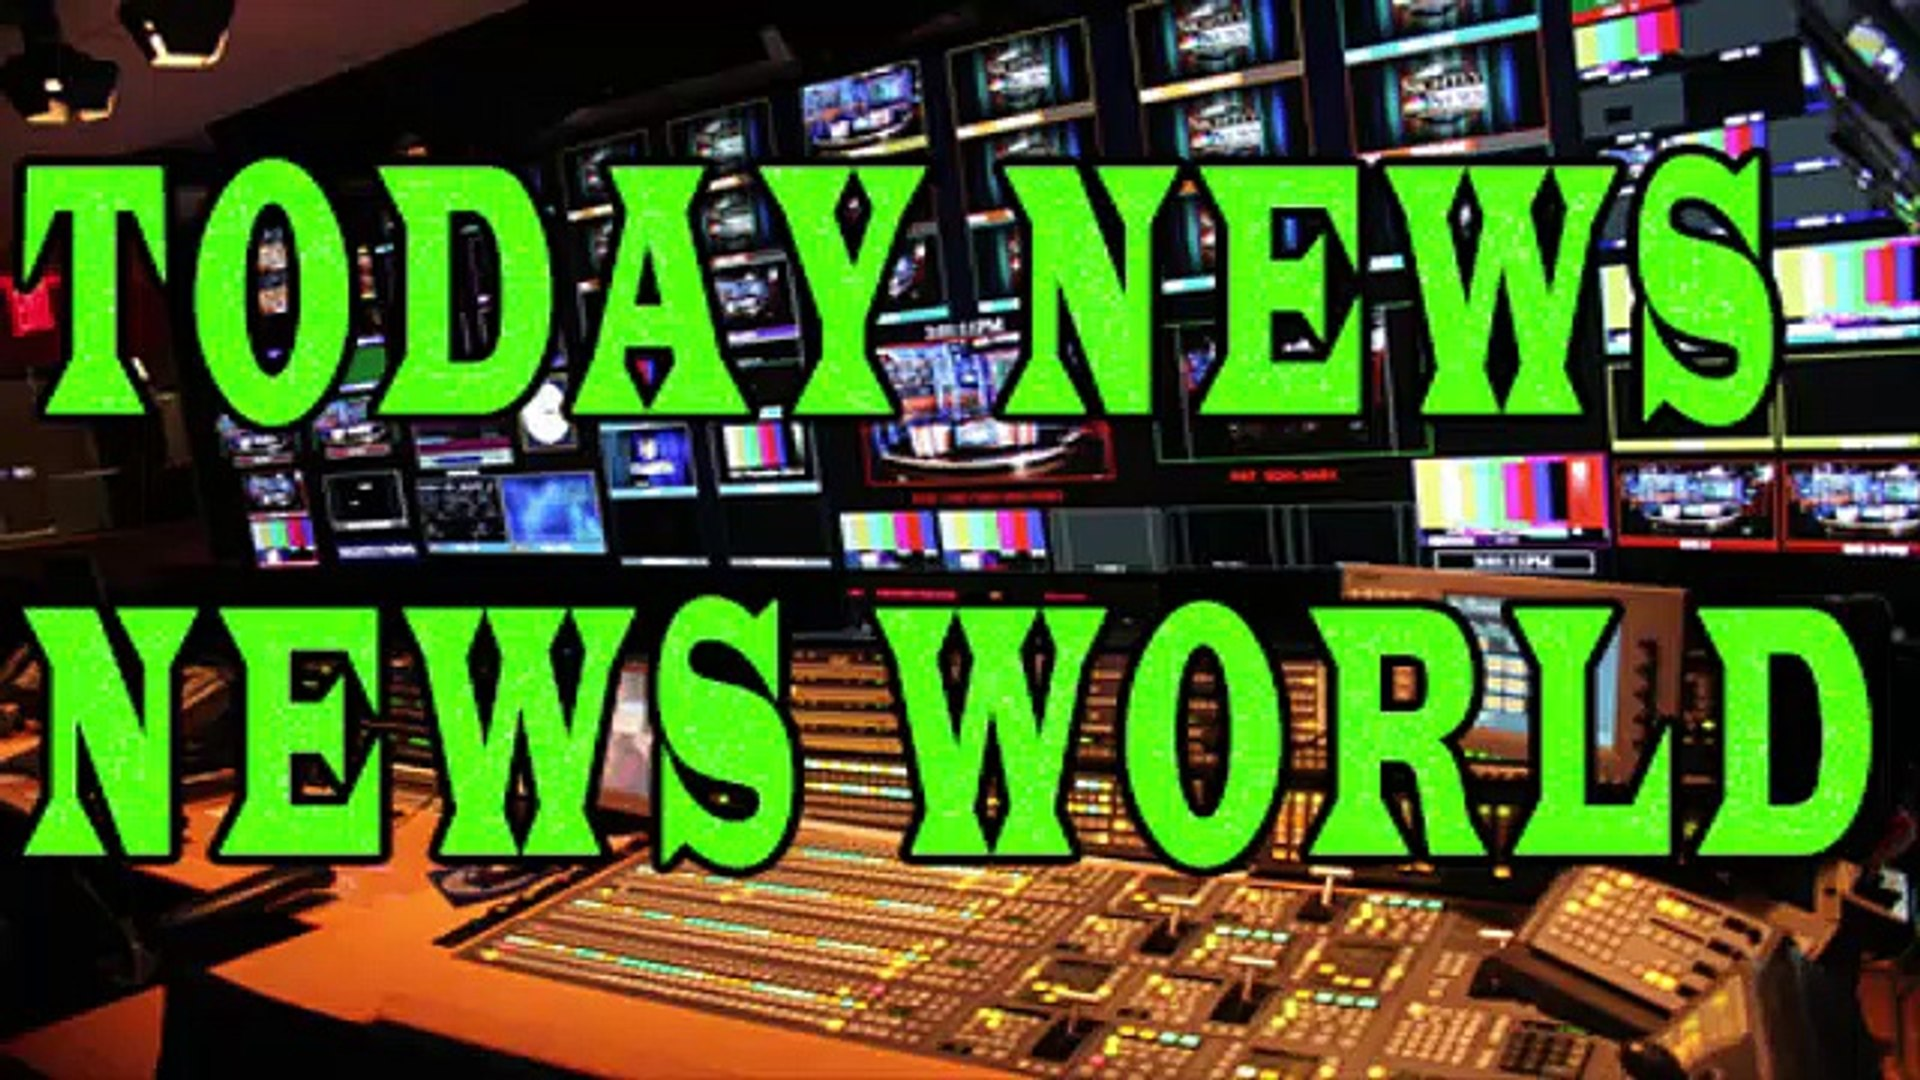 Today-Pakistani-News-5-January-2017-Latest-News-Today-News-Current-Affairs